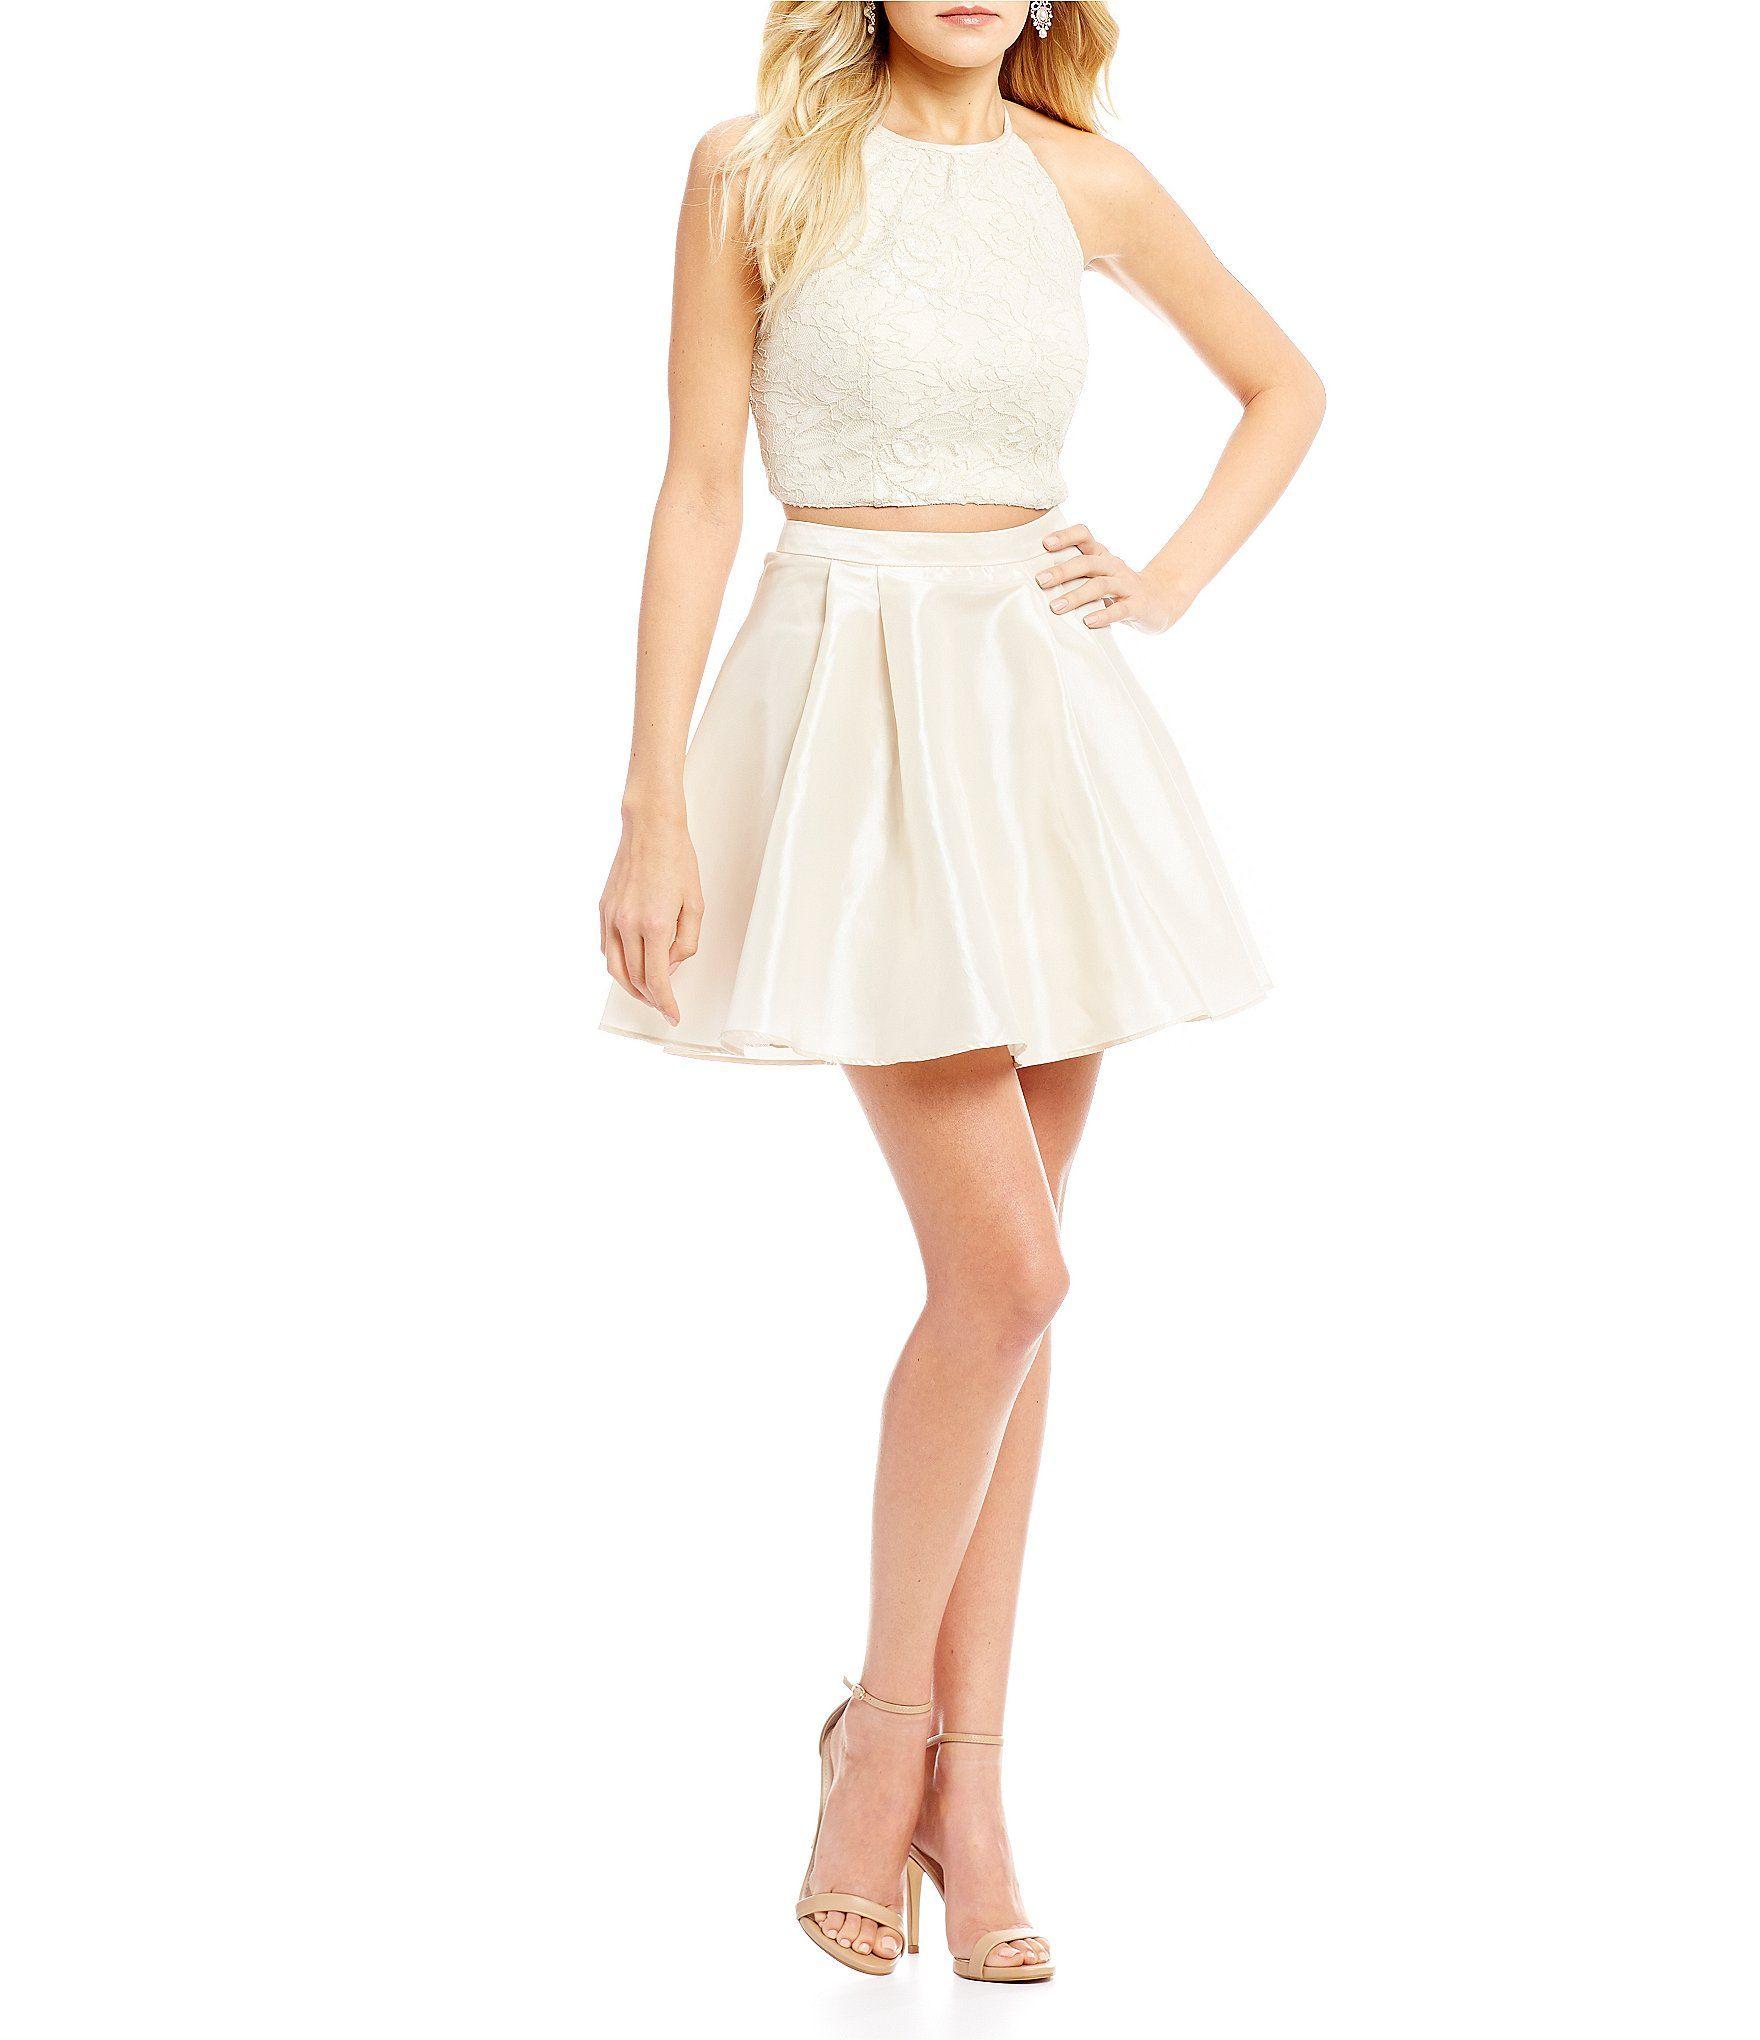 Shop for b darlin twopiece foil lace top party dress at dillards